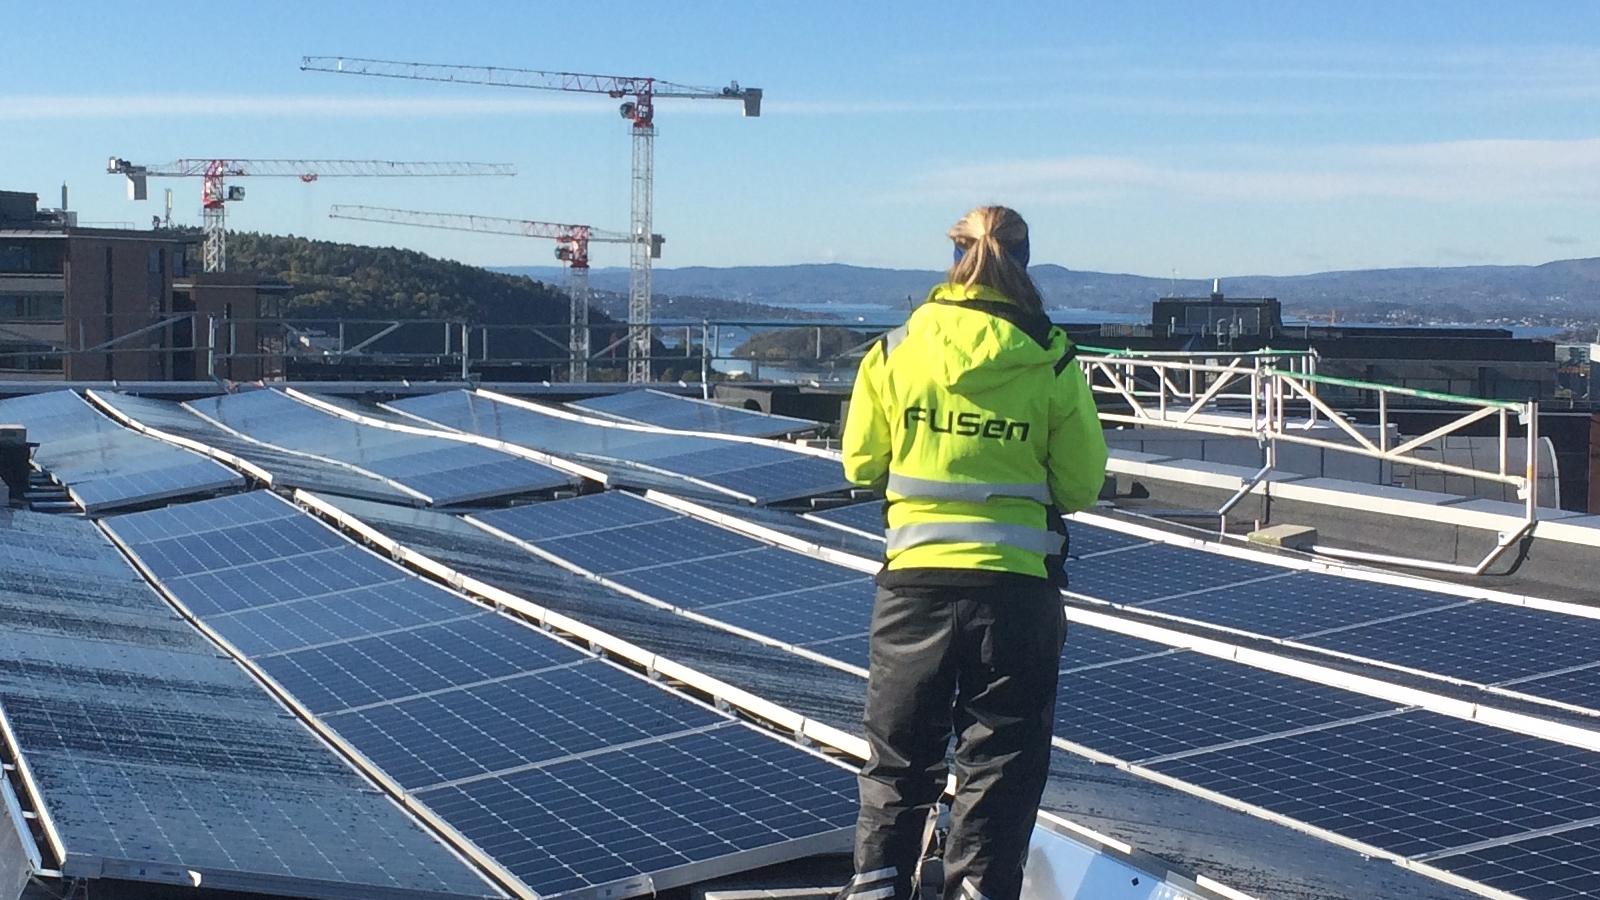 En ny rekord for solenergi